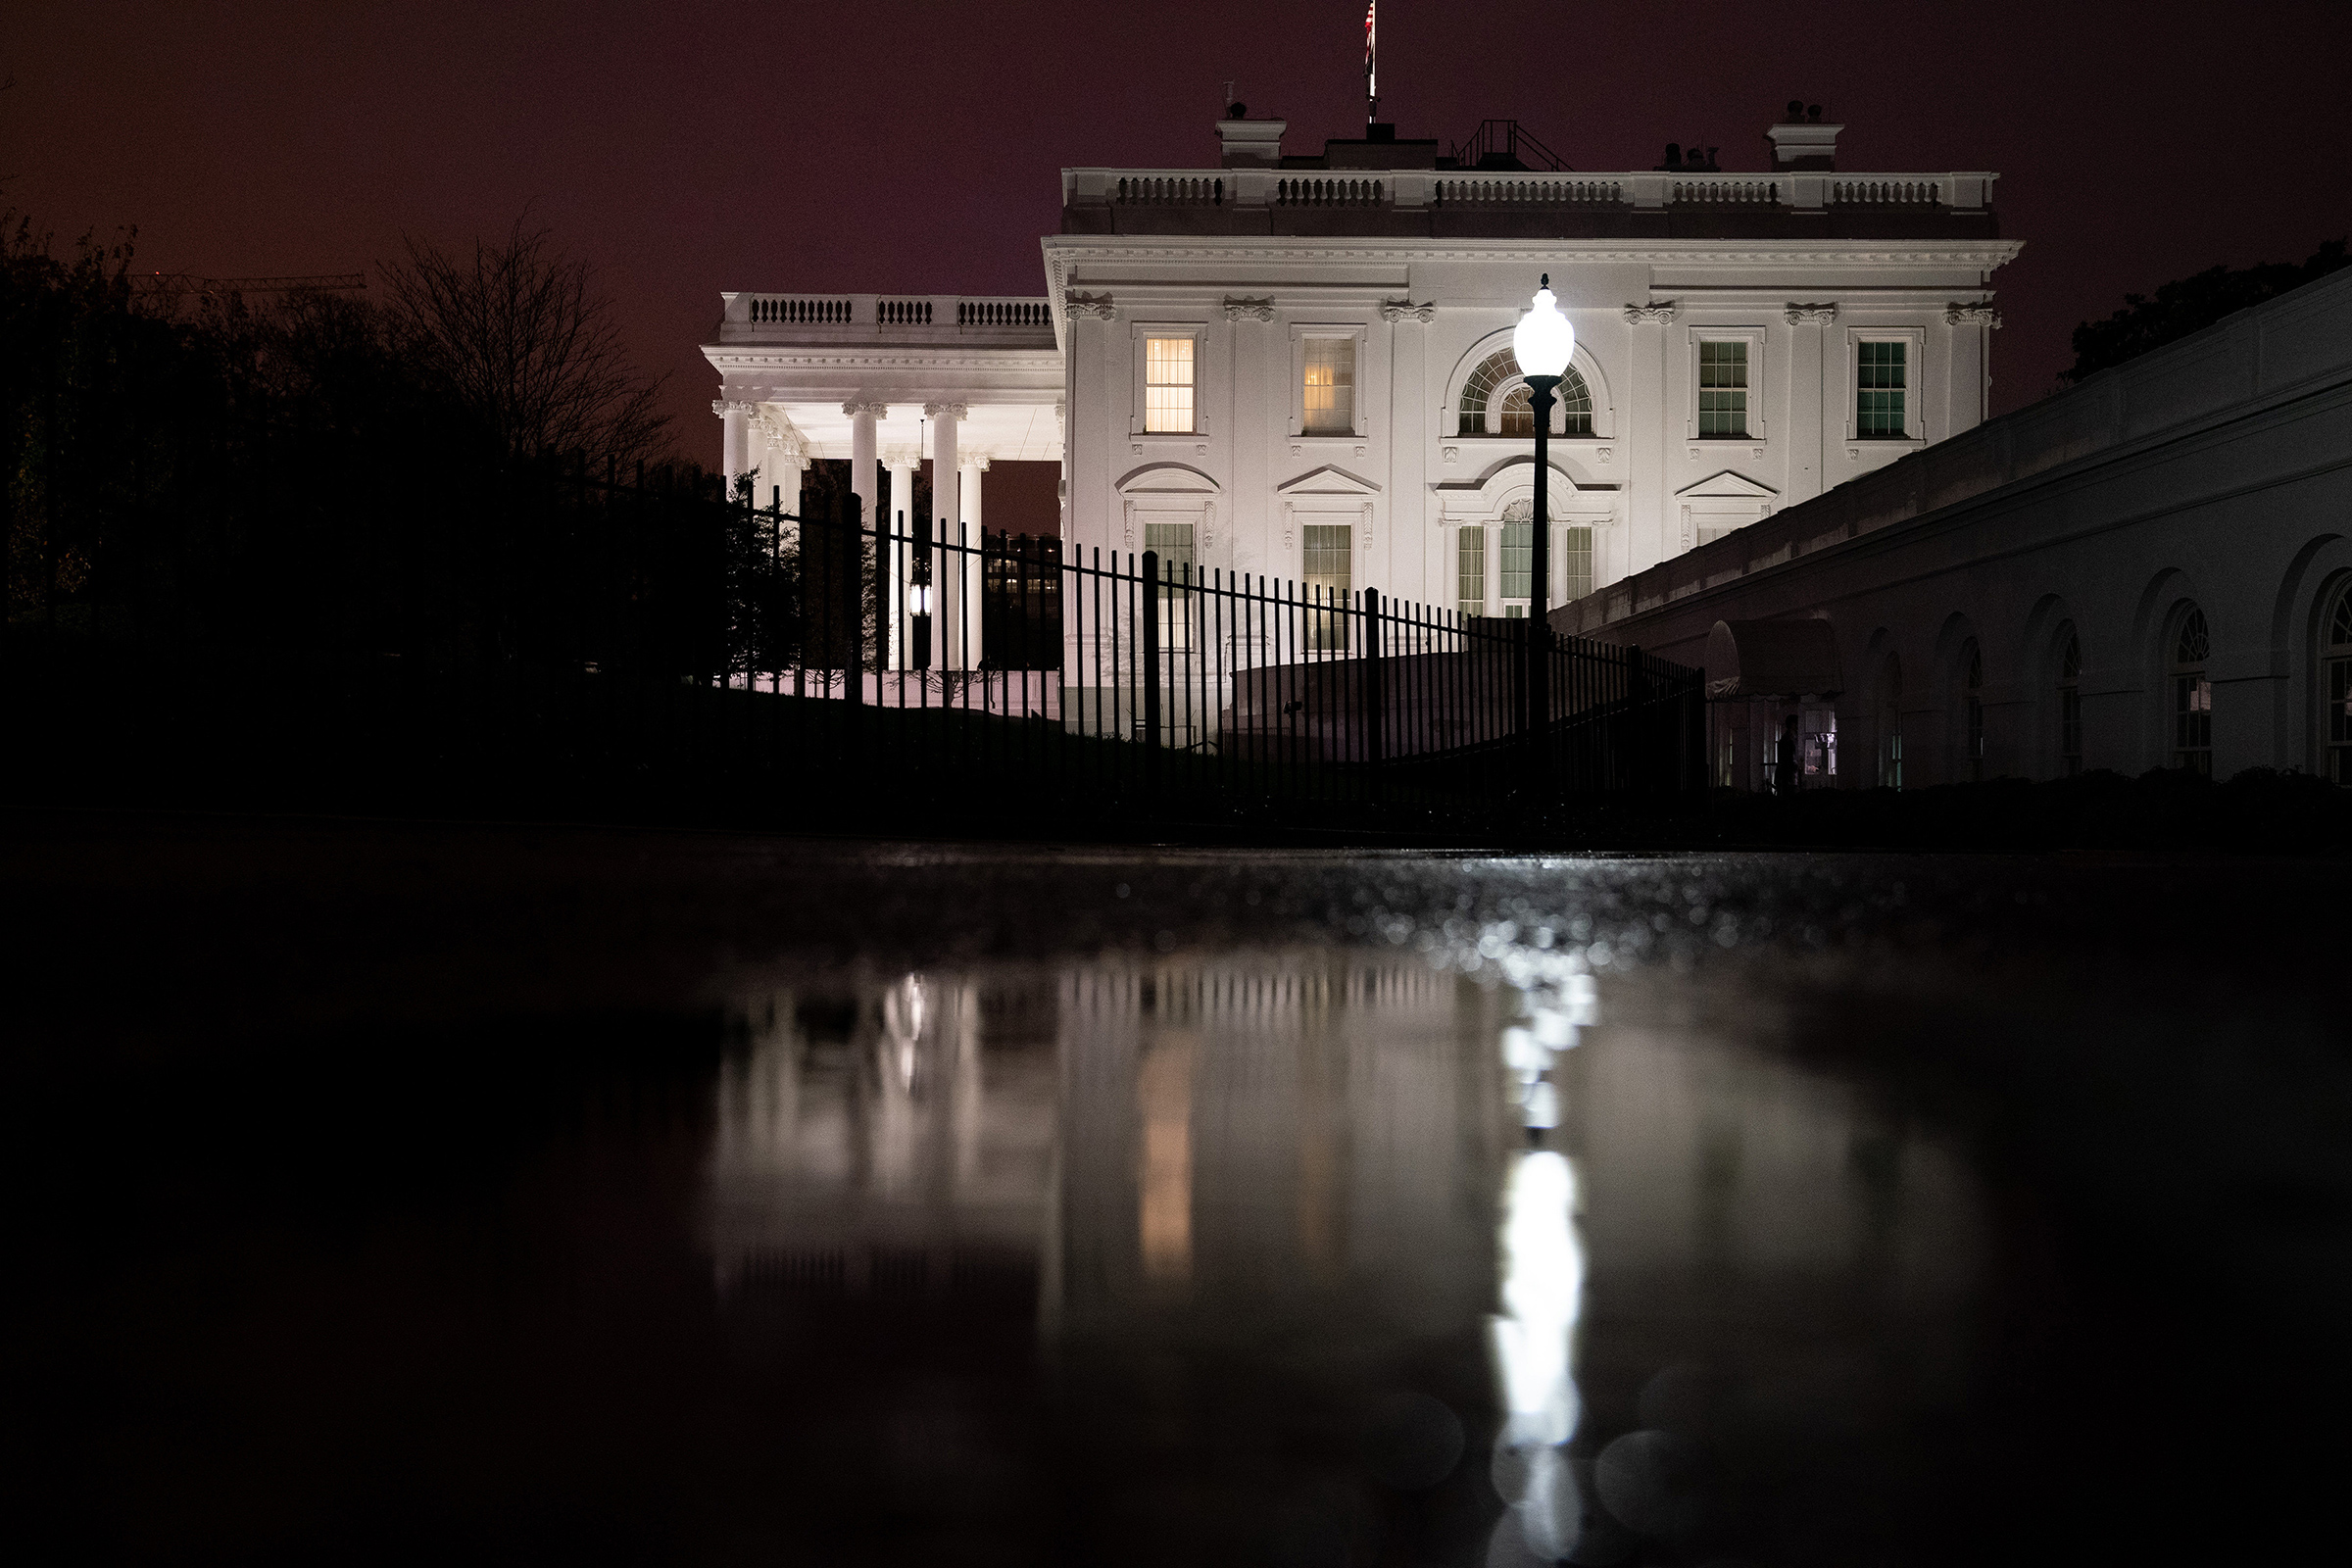 Outside the White House on Nov. 11